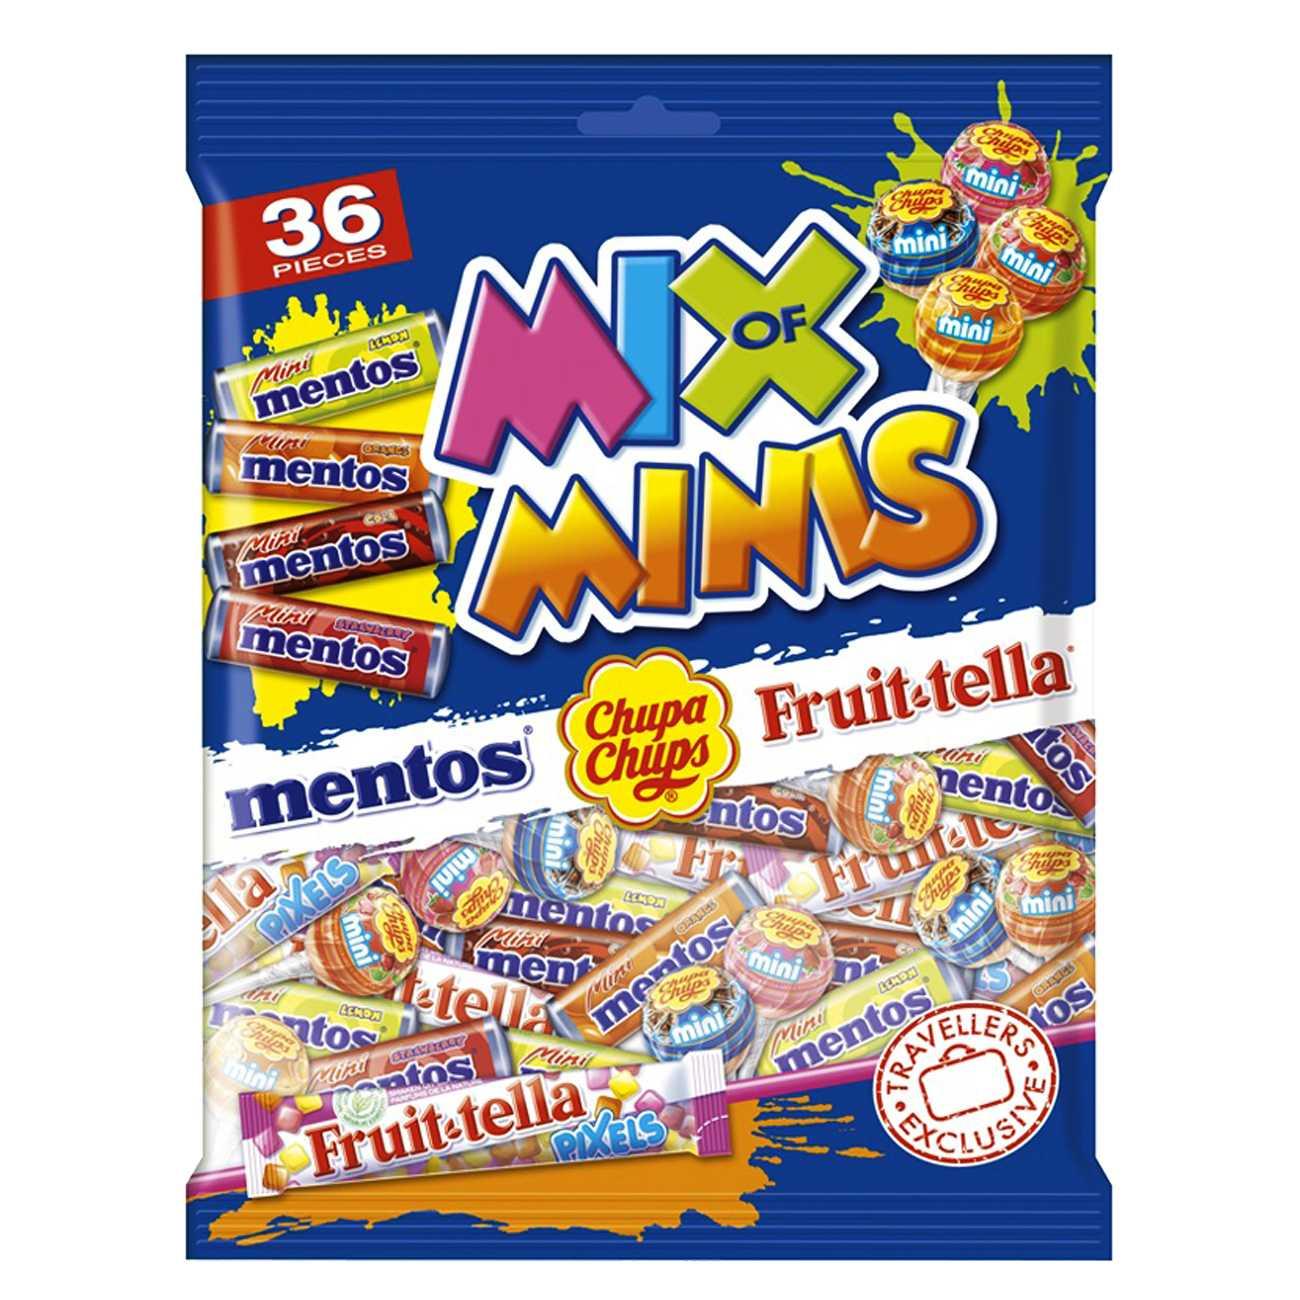 MIX OF MINIS 416 G